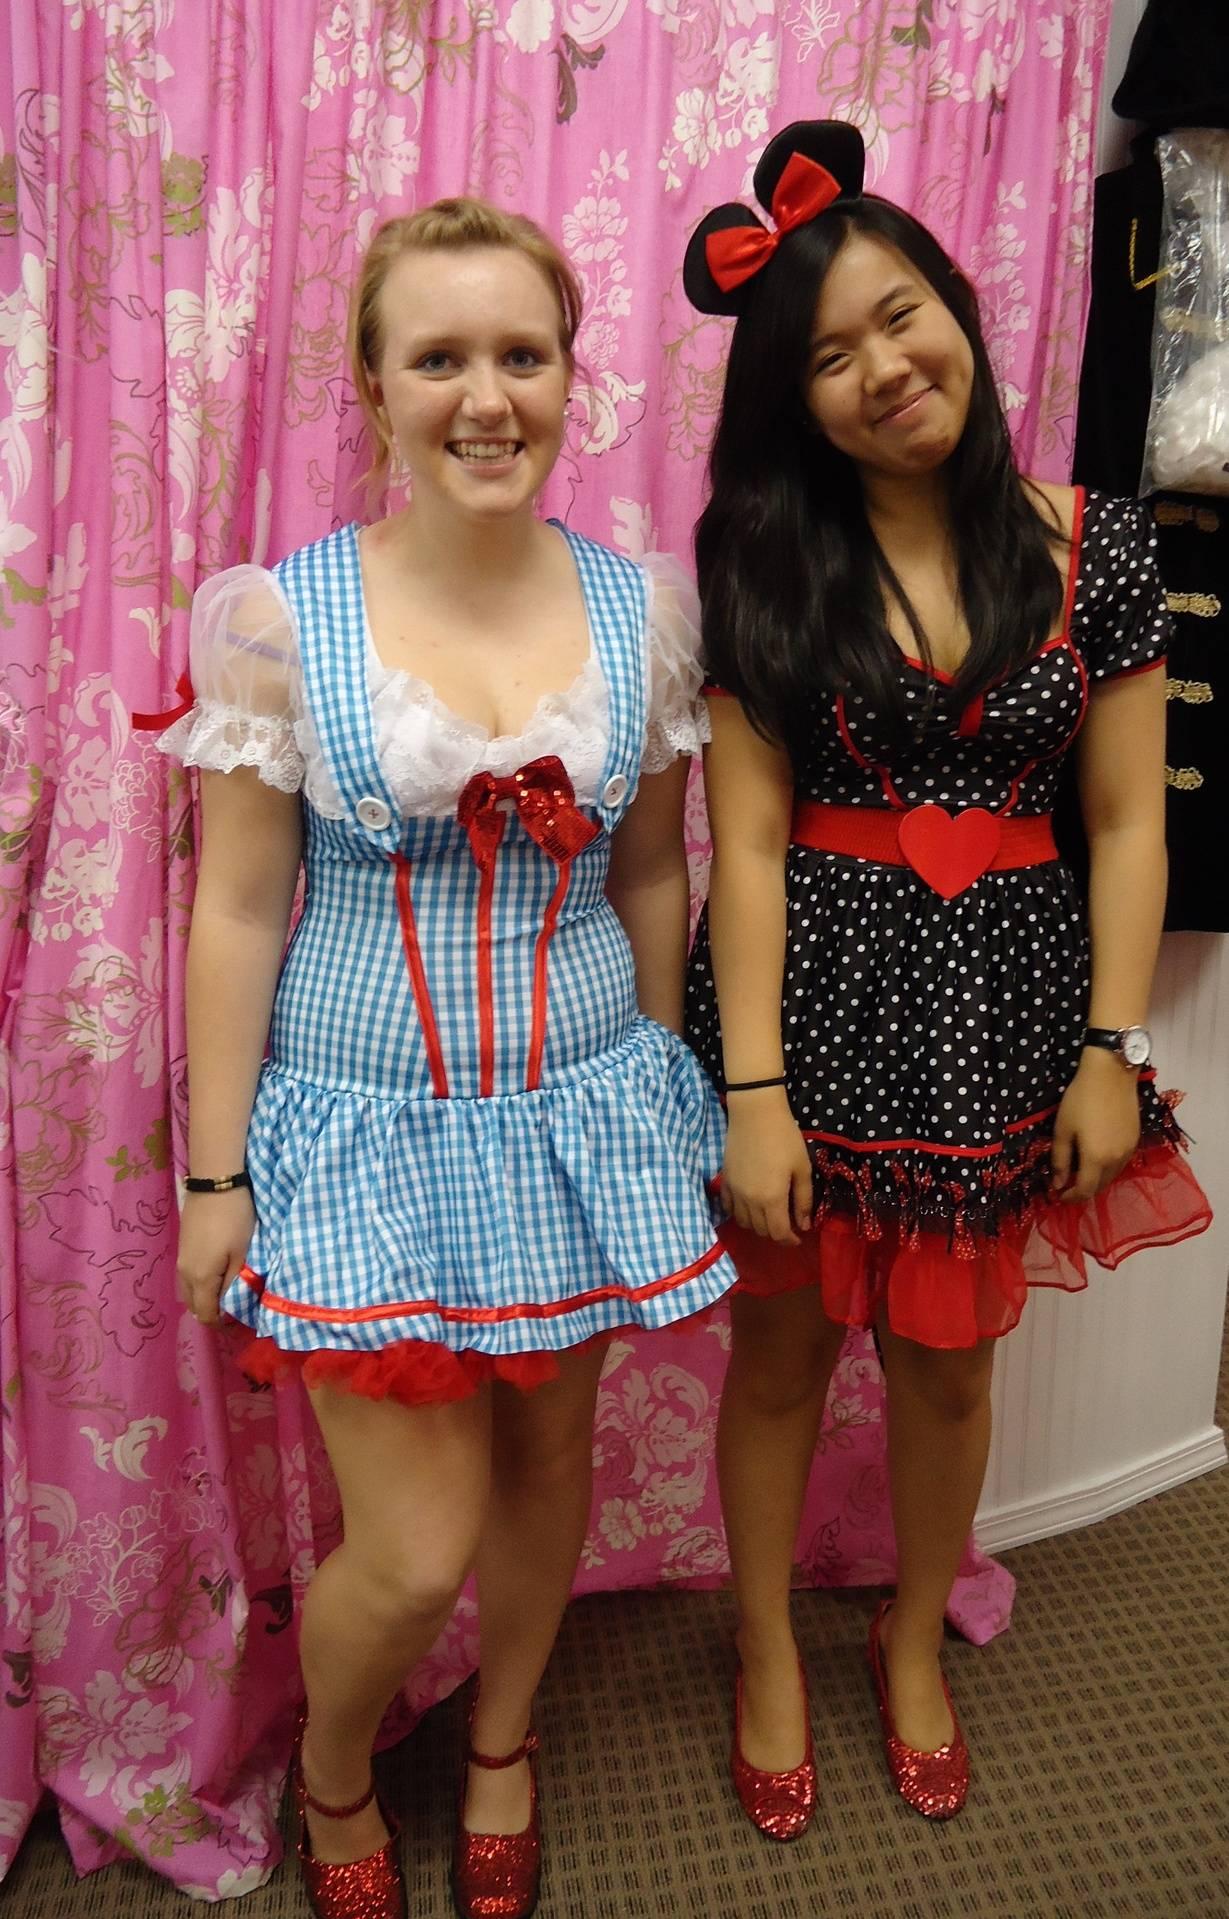 Disney Characters, Leg Avenue & Dreamgirl